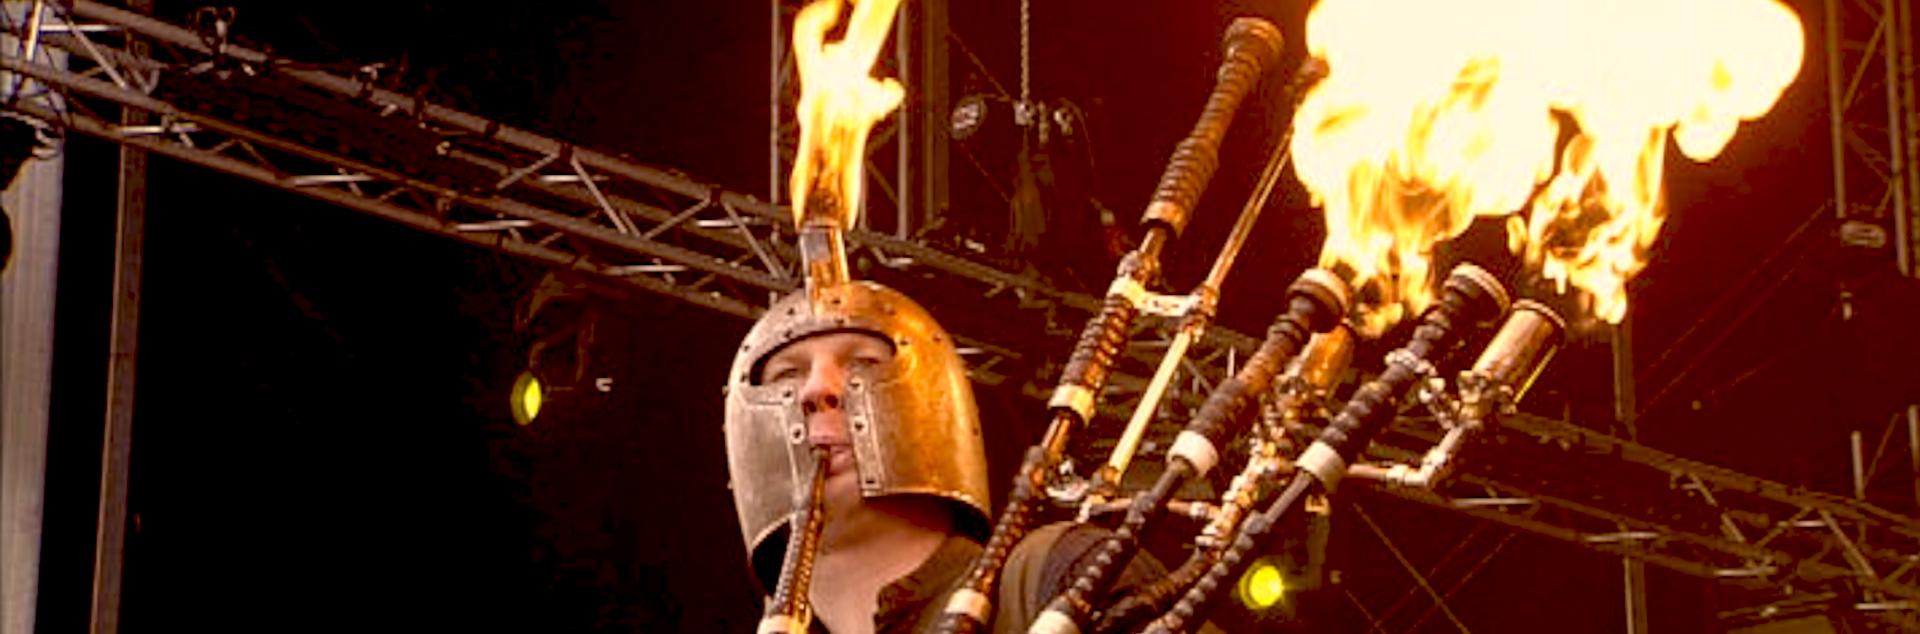 Celtic-Folk-Music-Full-Live-Concert---Rapalje-@-Bevrijdingsfestival-Overijssel-Zwolle,-The-Netherlands